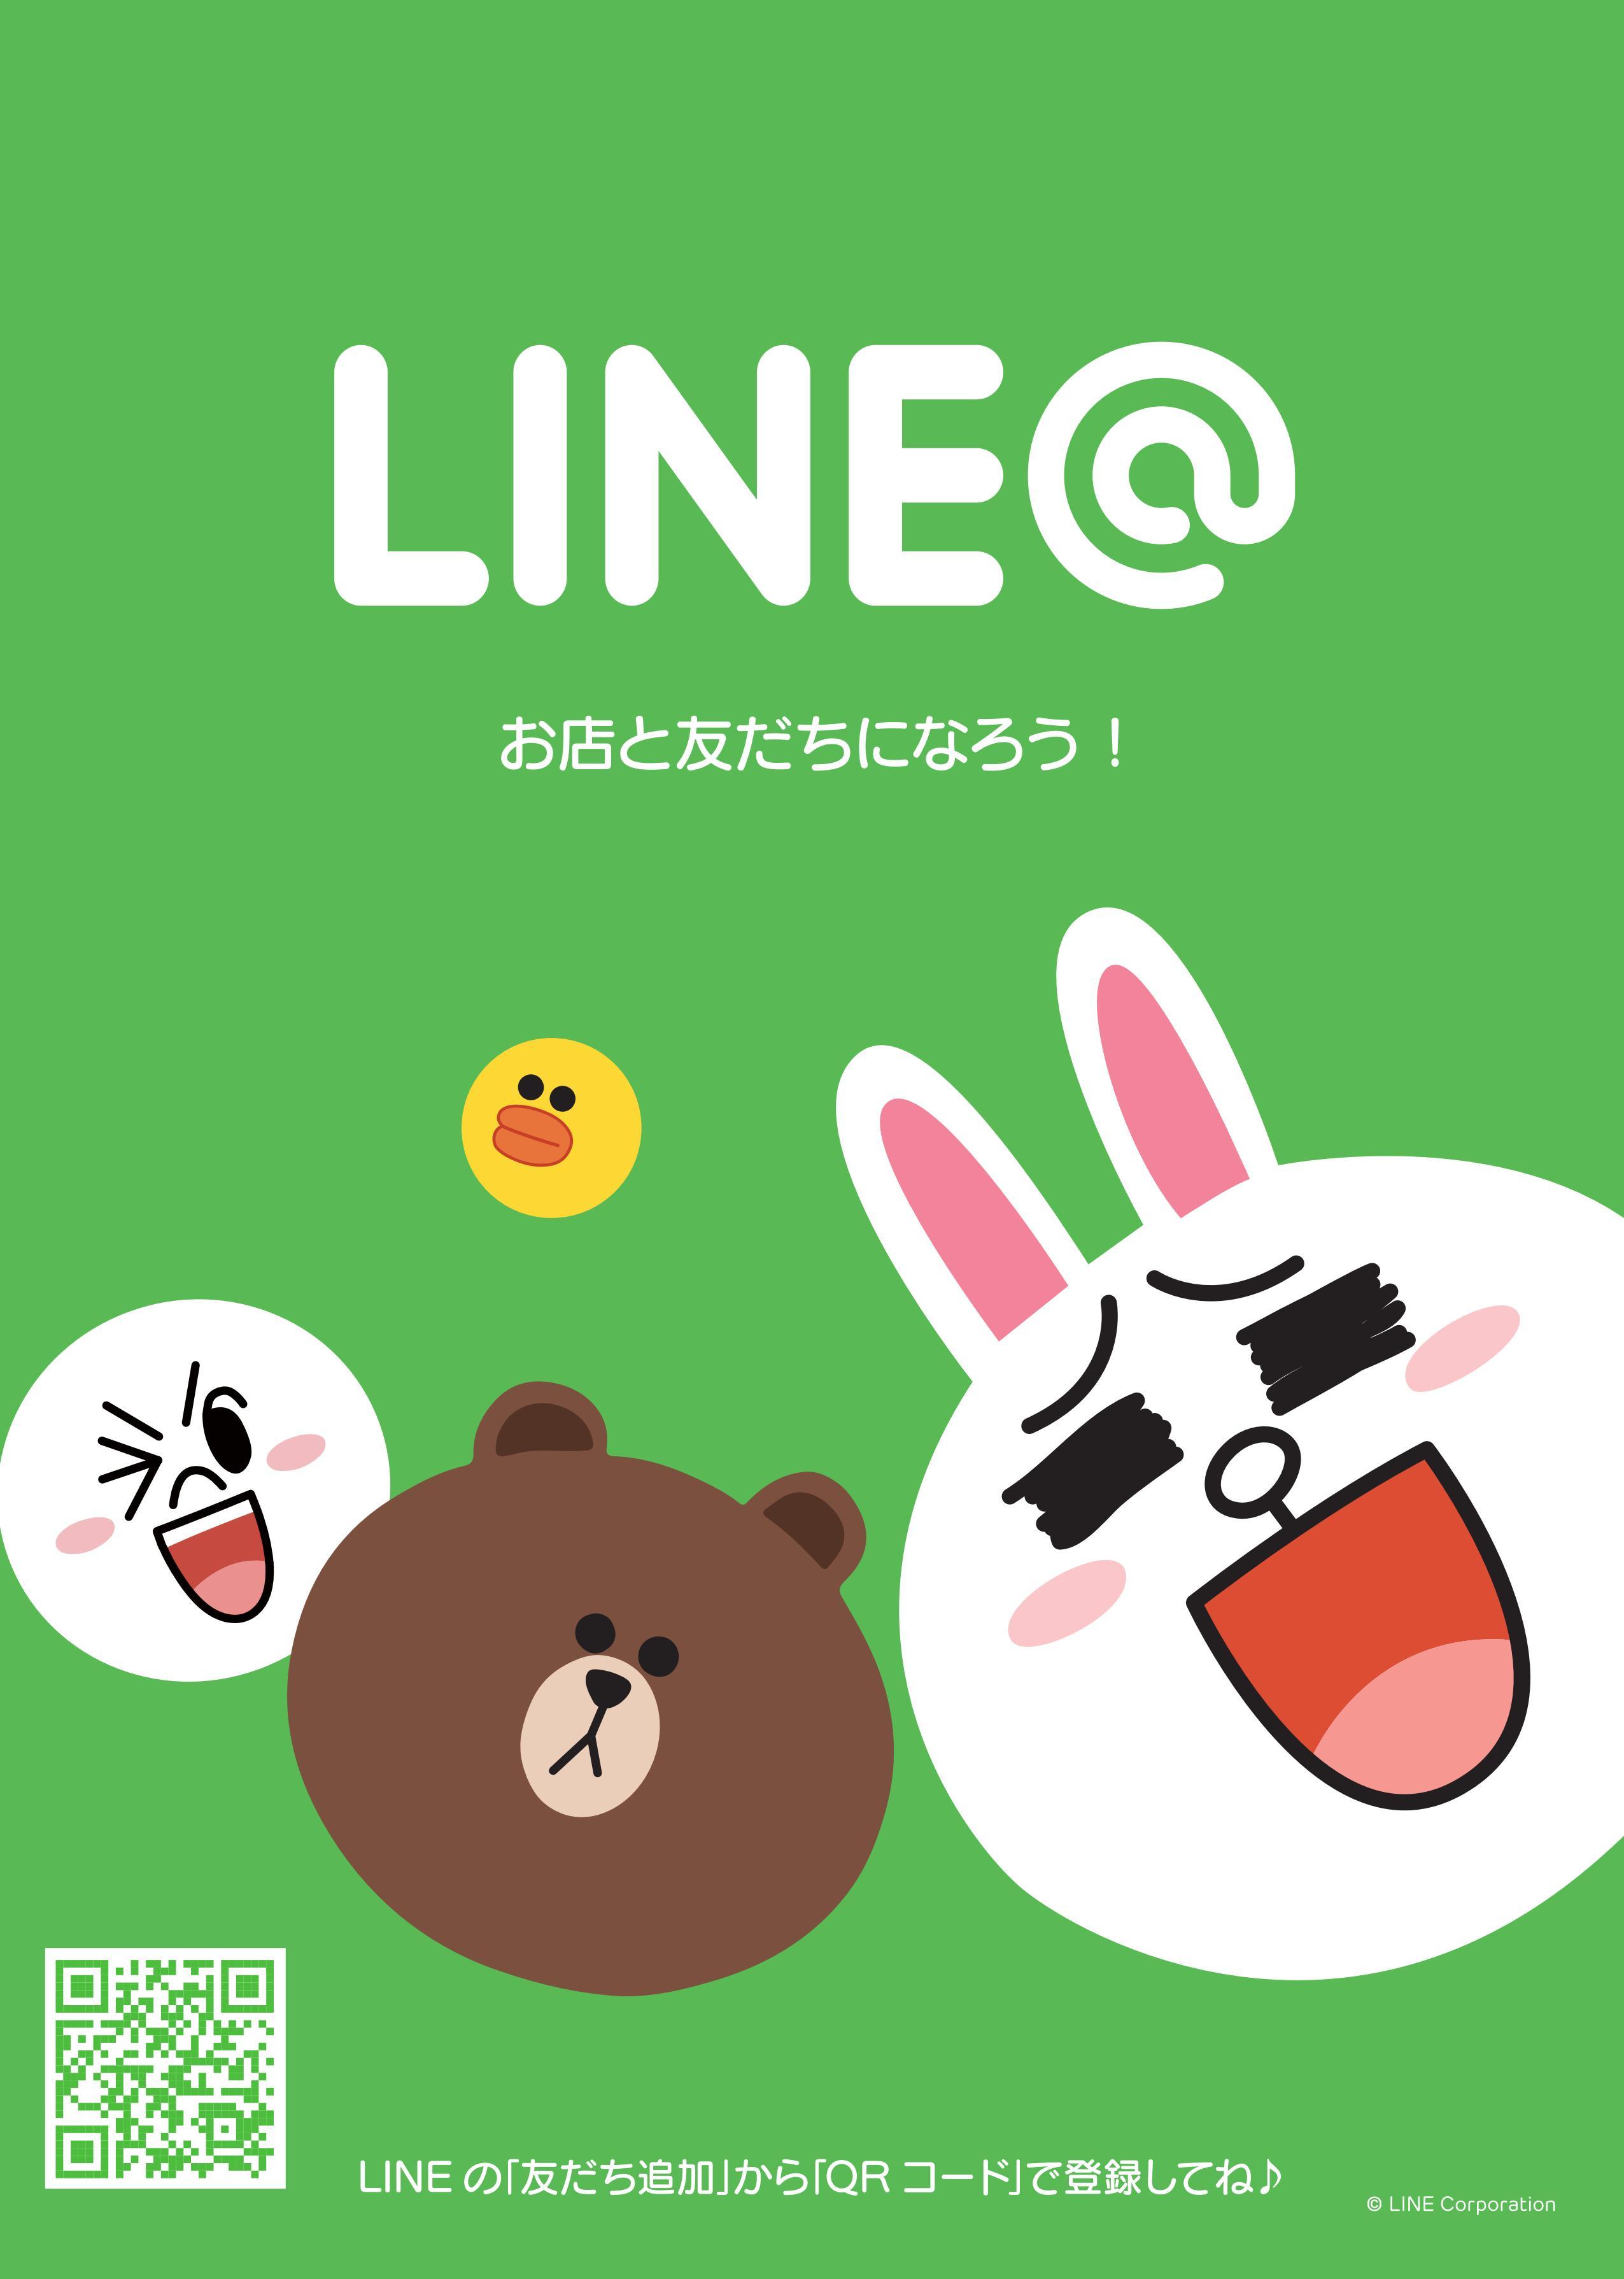 lineat-poster-ja_1-noid_8_01.jpg